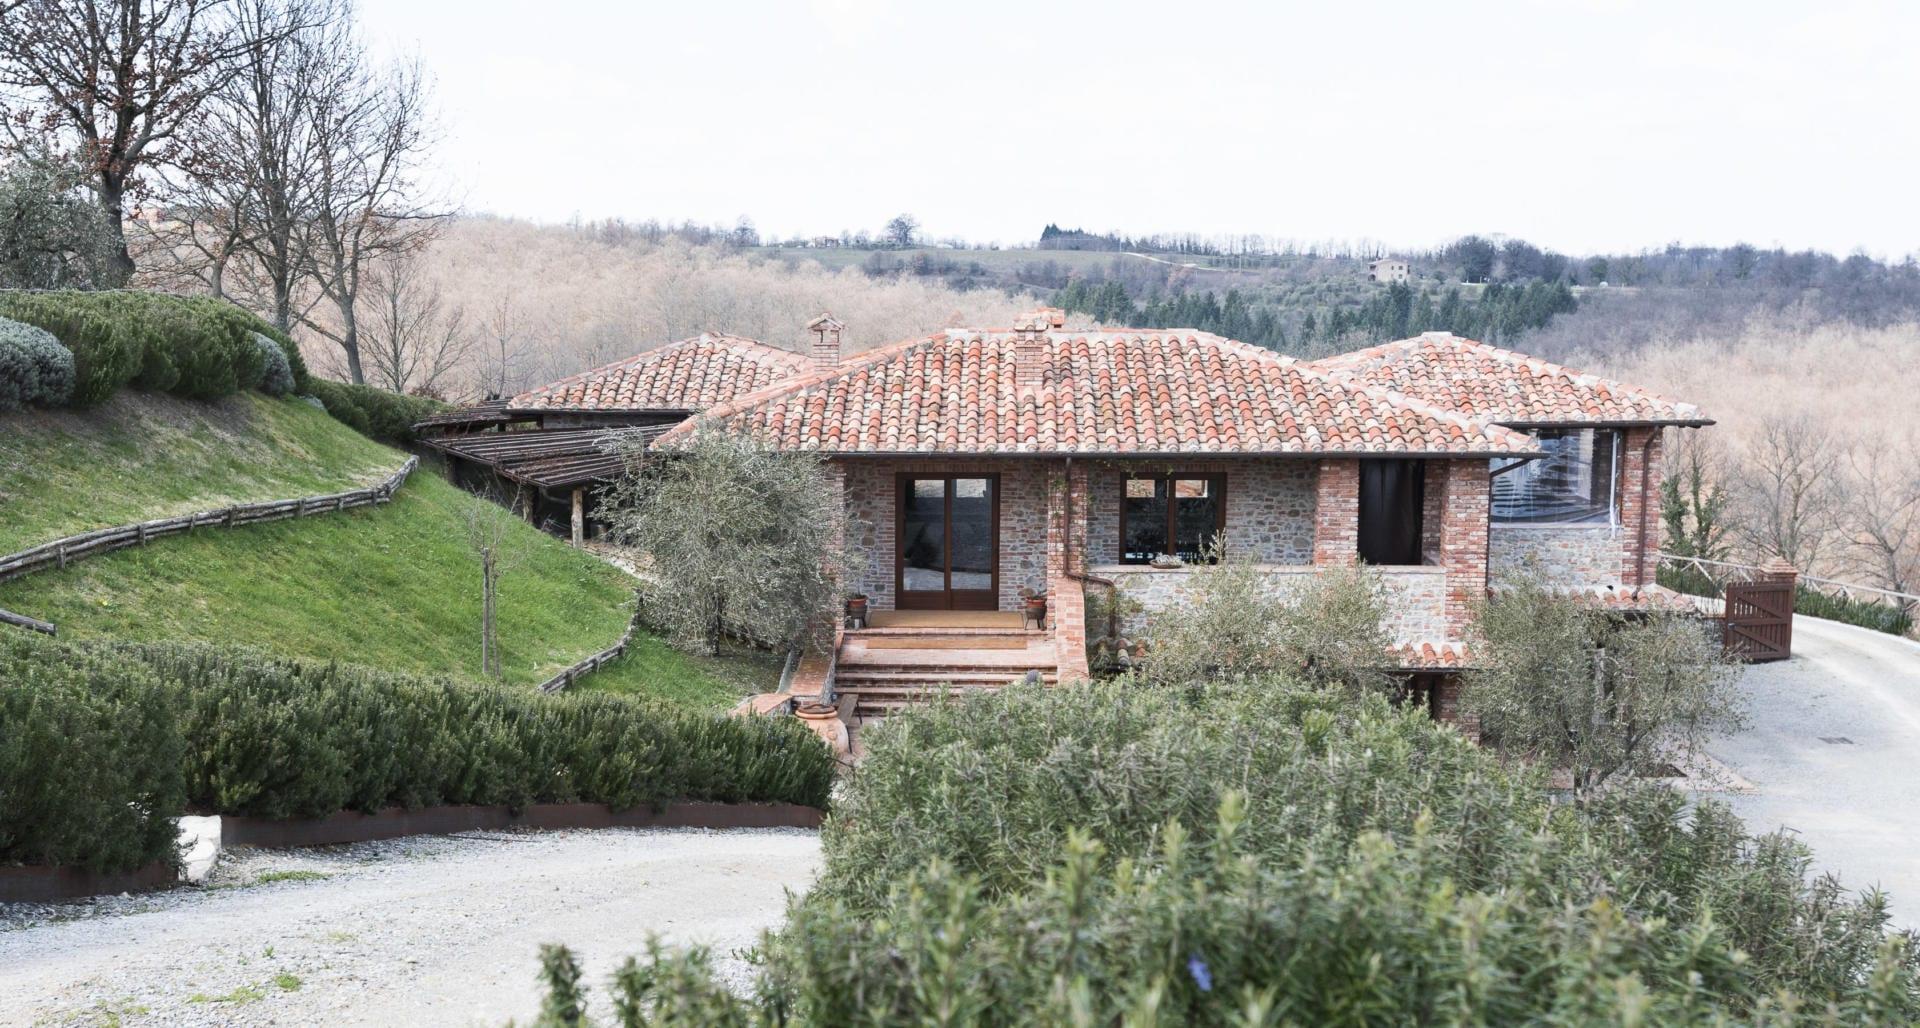 Azienda Agricola Pomario - produksjon av vin og olivenolje - Foto: Paolo Menchetti